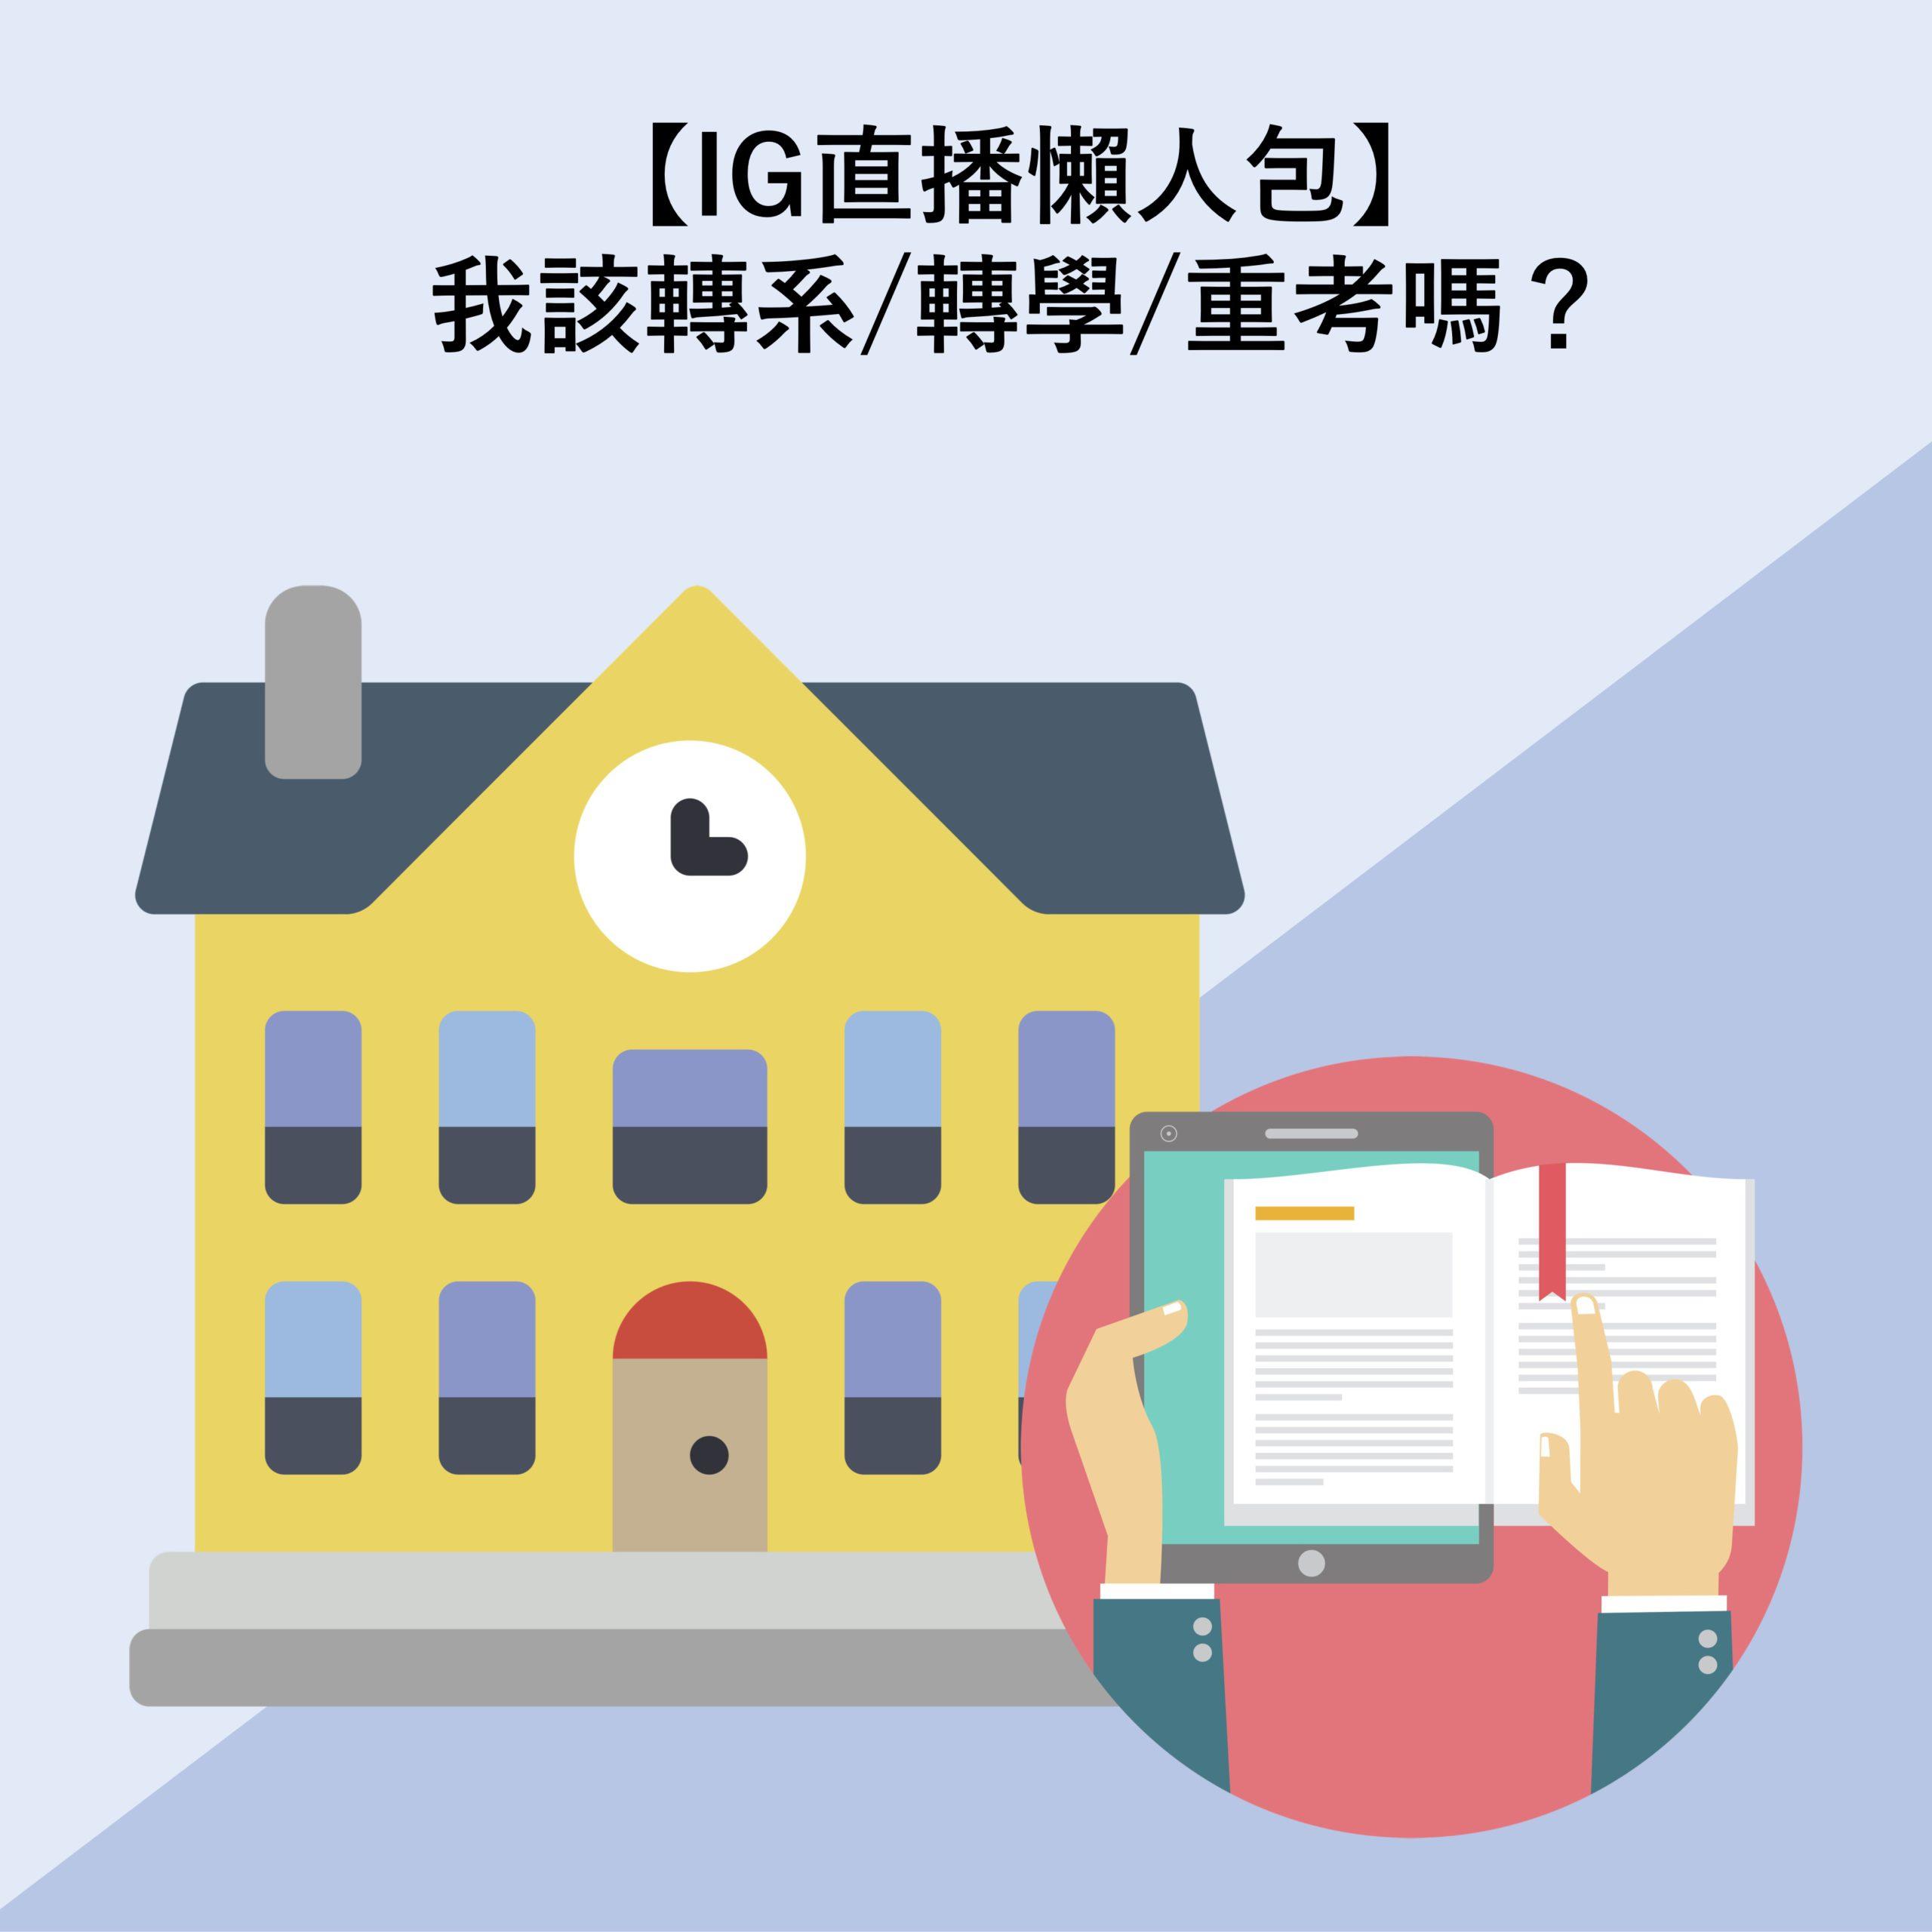 【IG直播懶人包】我該轉系/轉學/重考嗎?